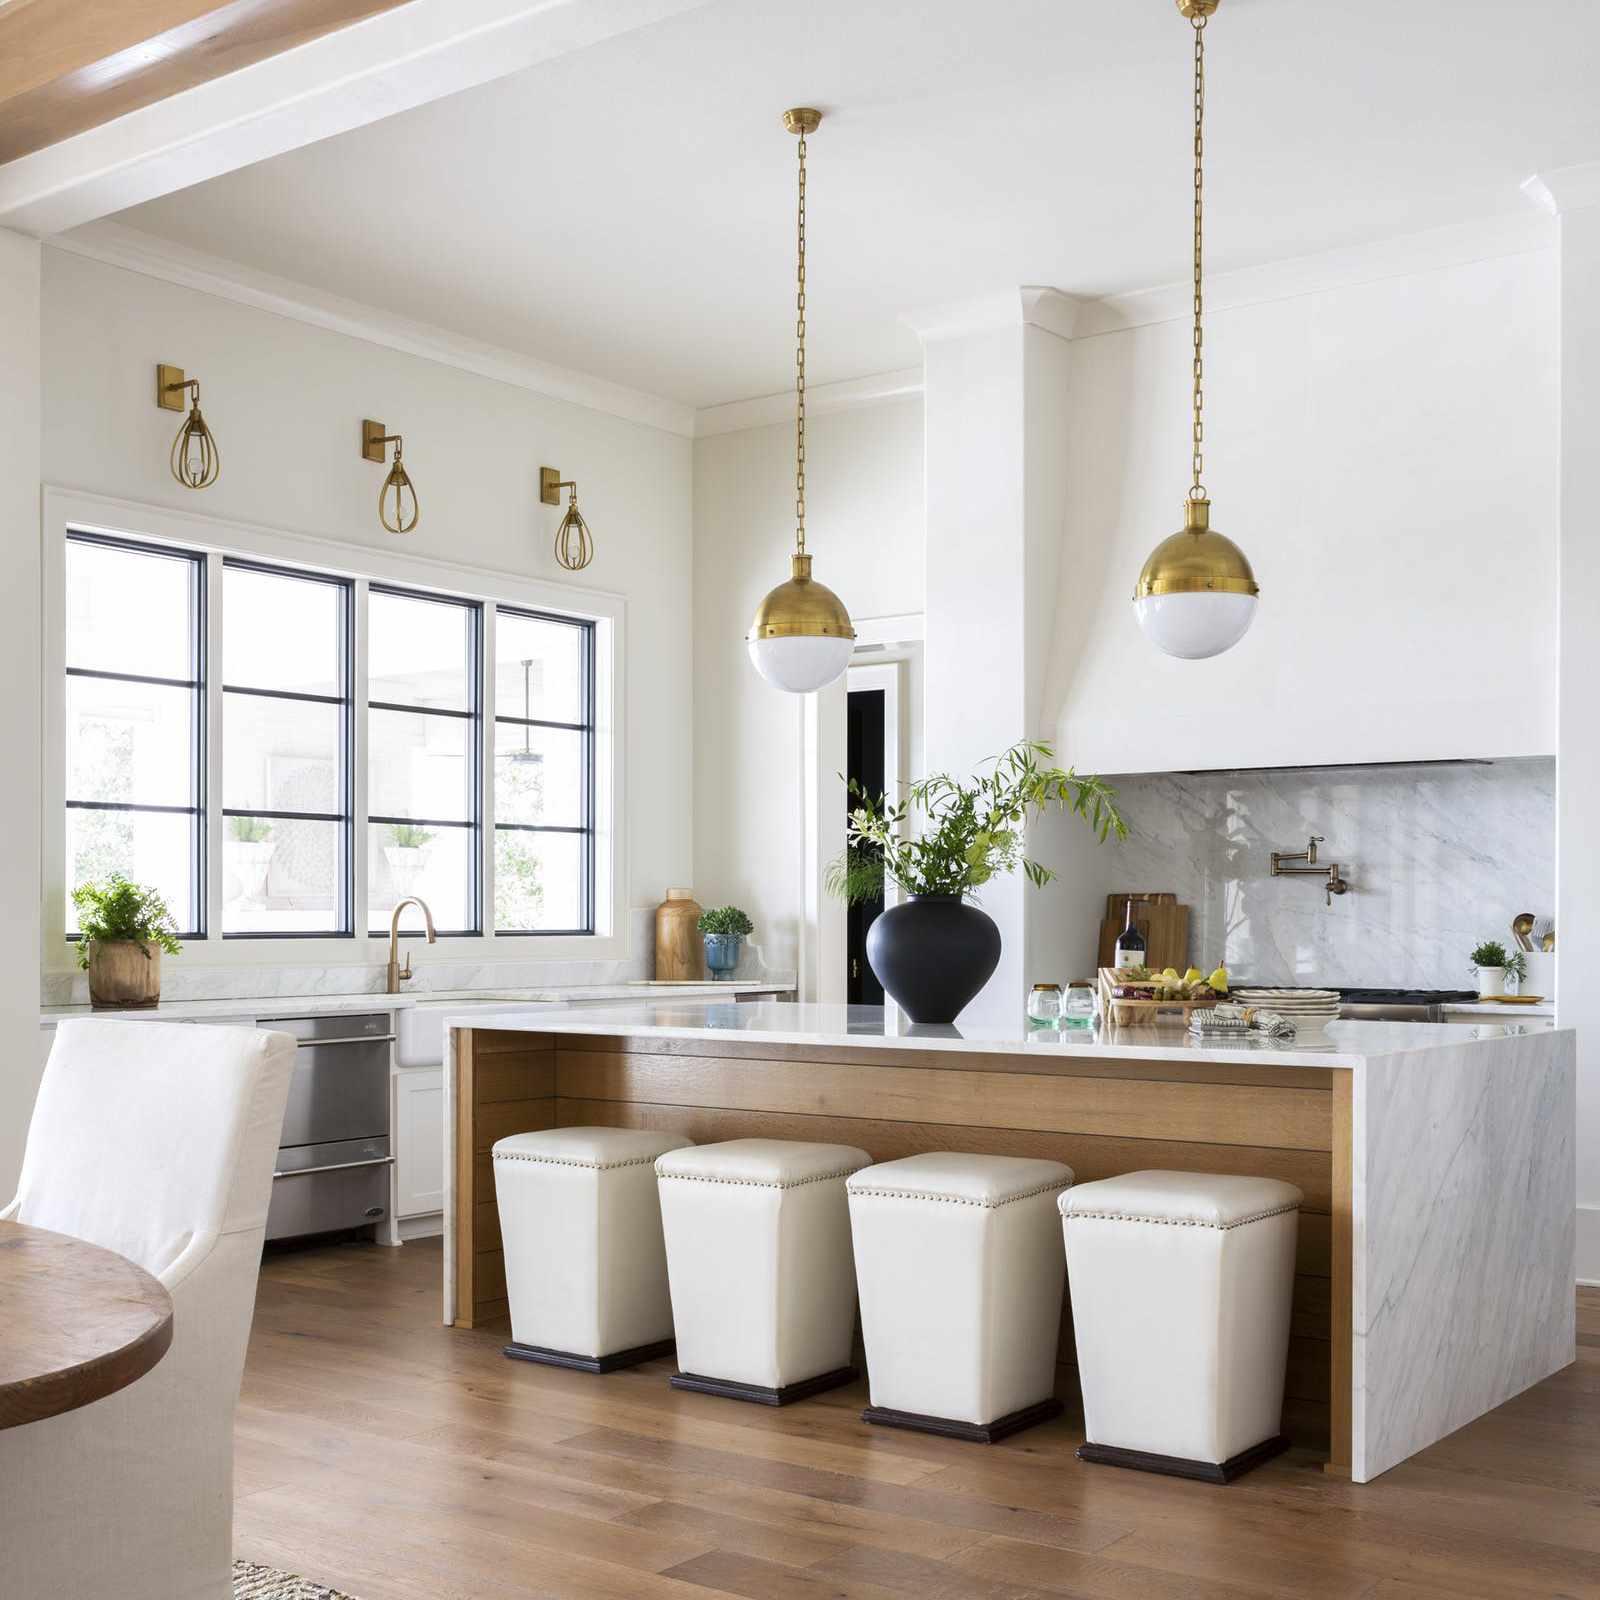 Waterfall Kitchen Countertops